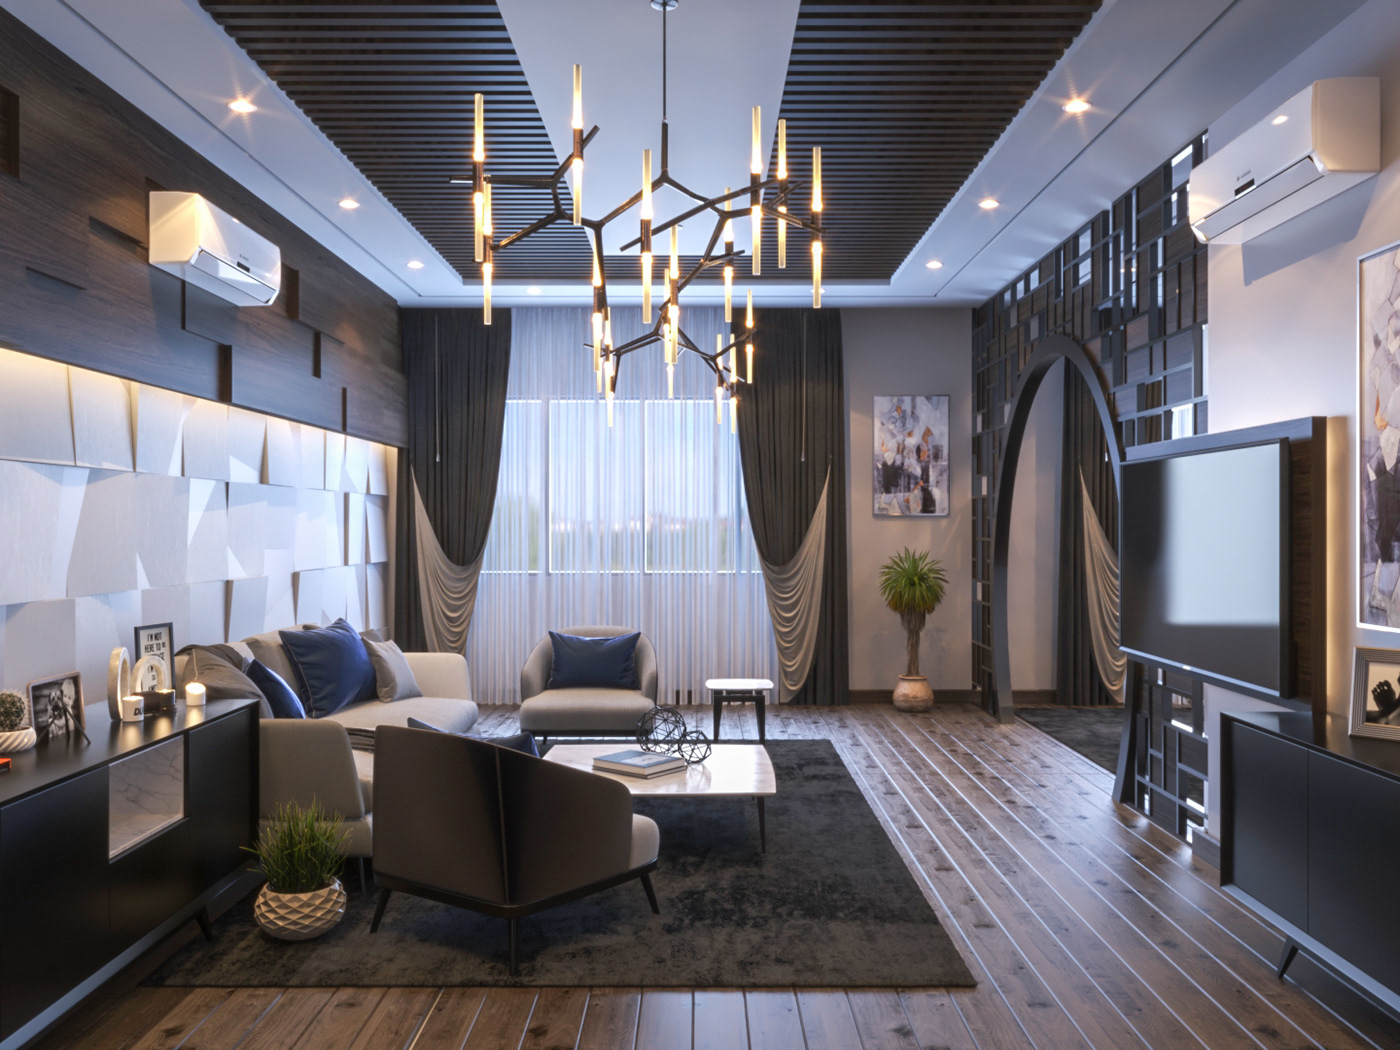 Interior design decor home Villa bedroom moder Render realistic free